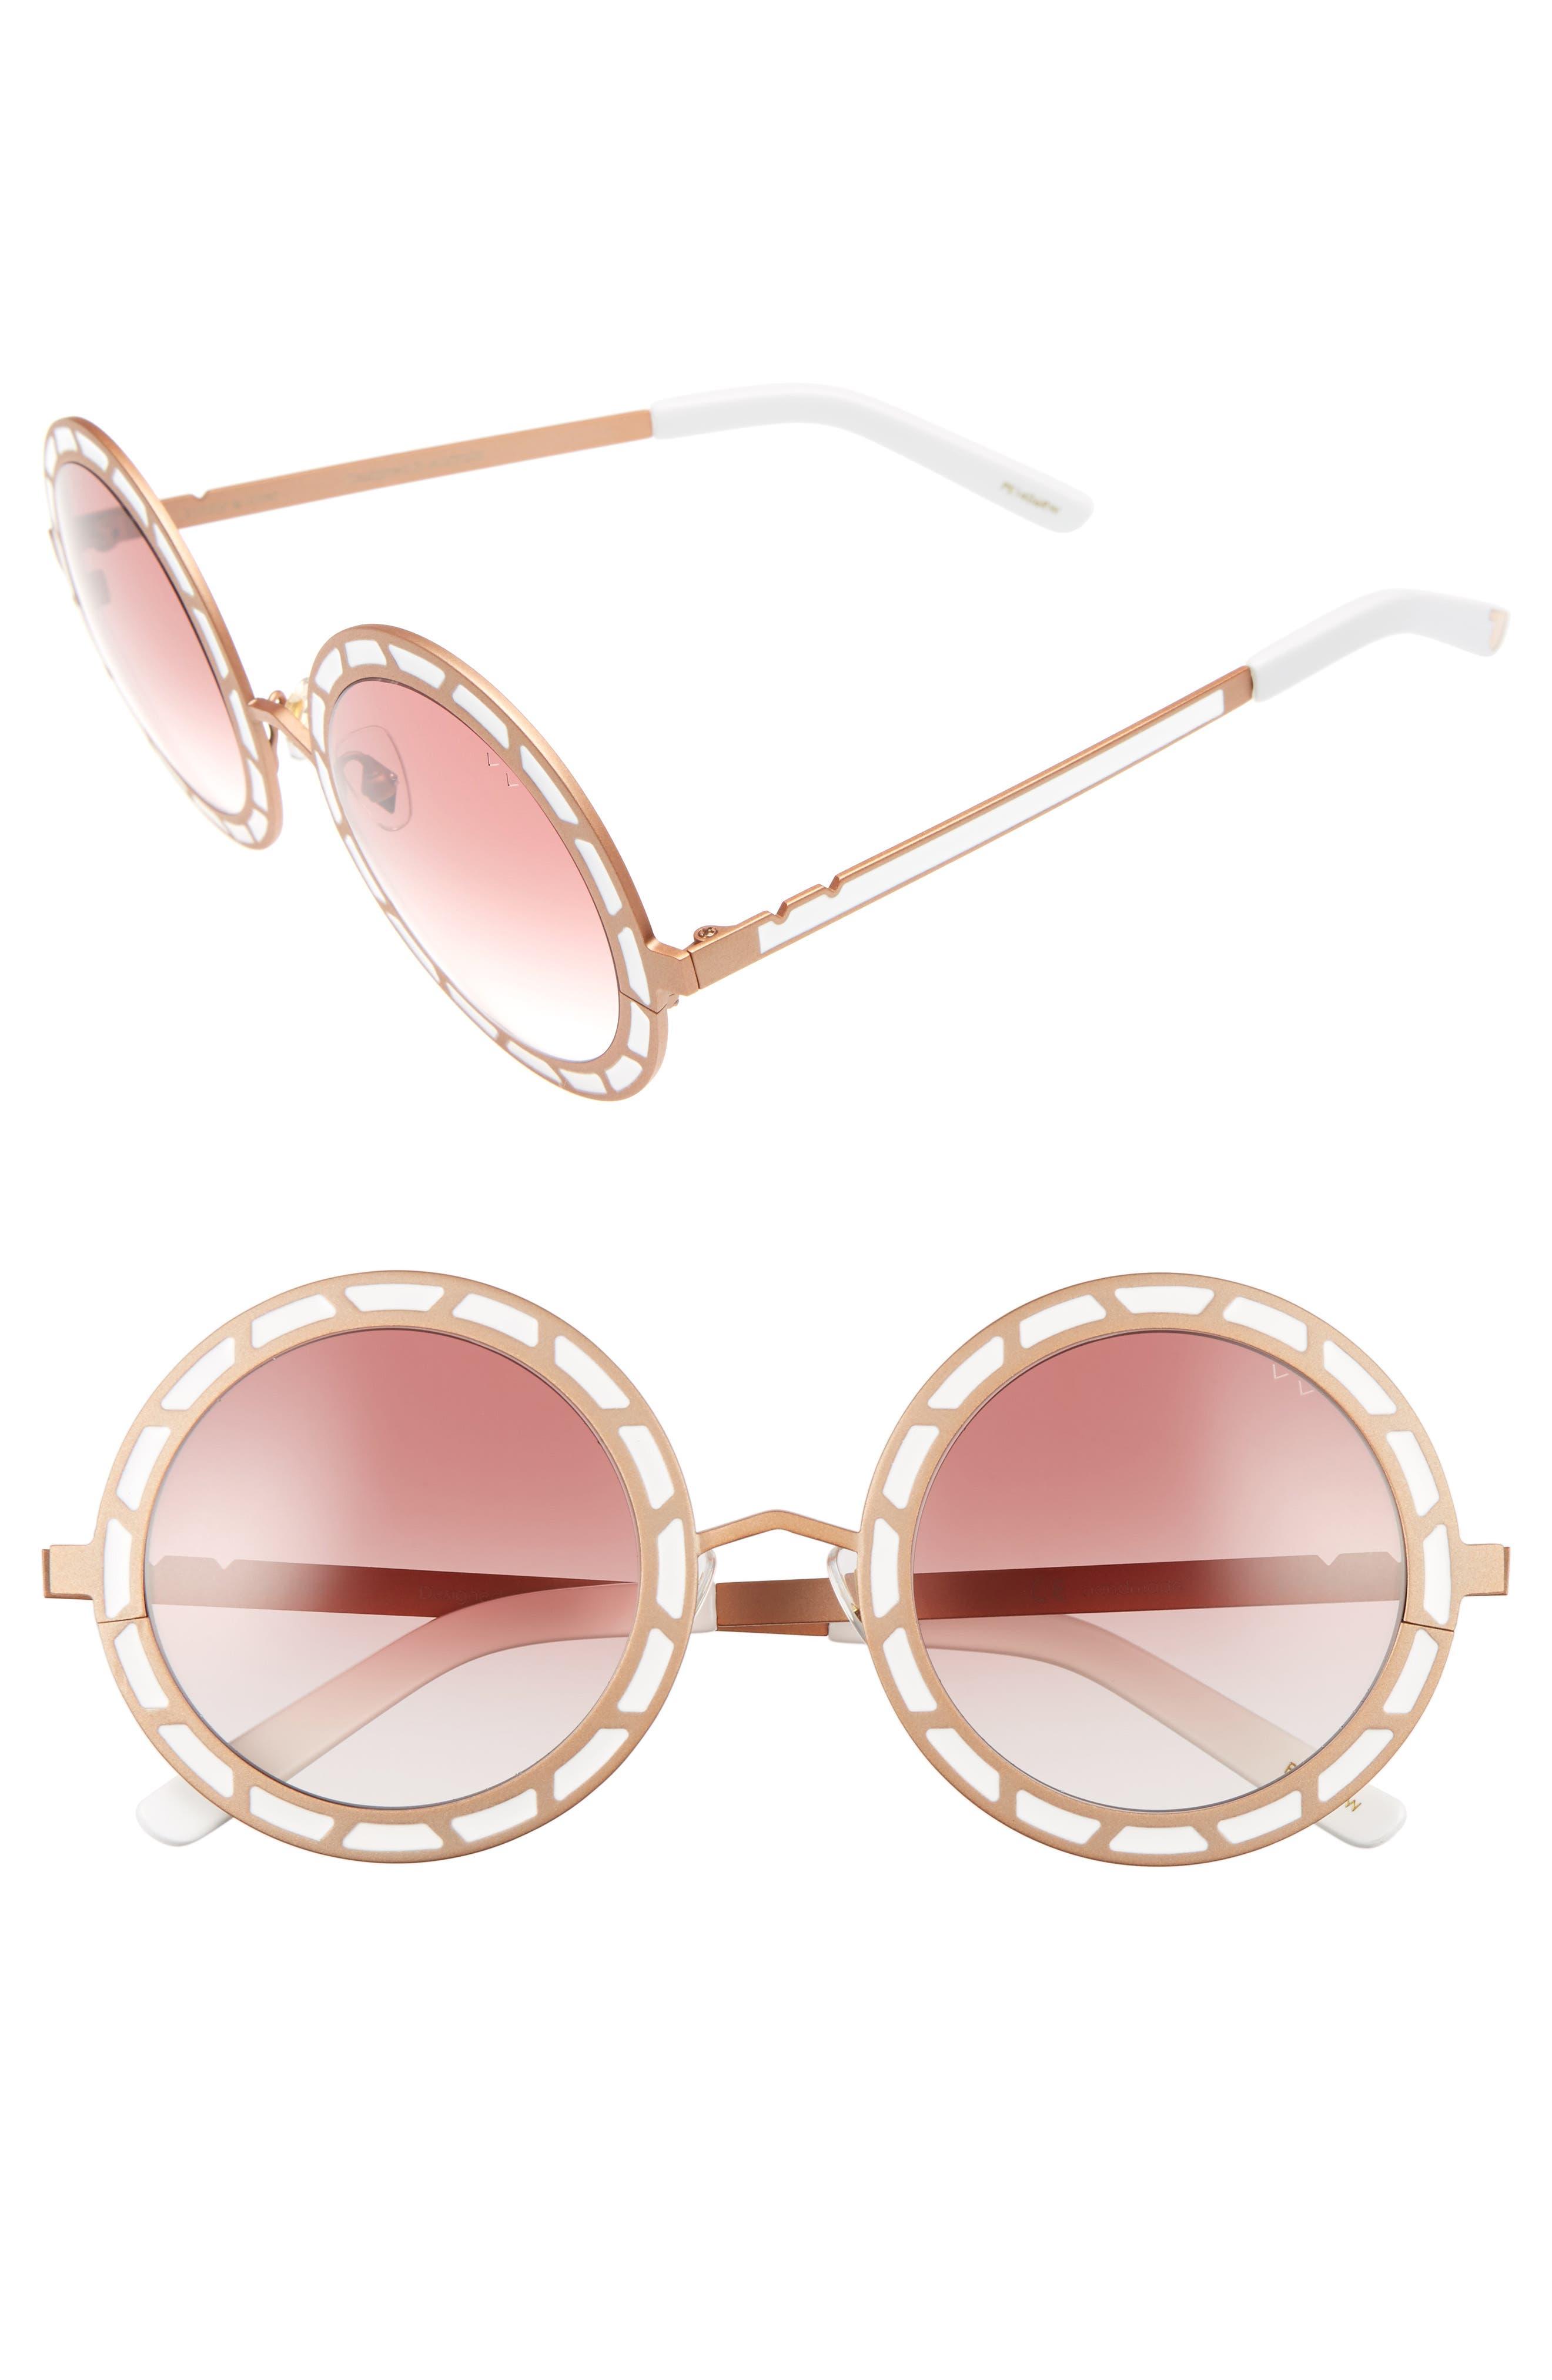 Sonny & Cher 50mm Round Sunglasses,                             Main thumbnail 3, color,